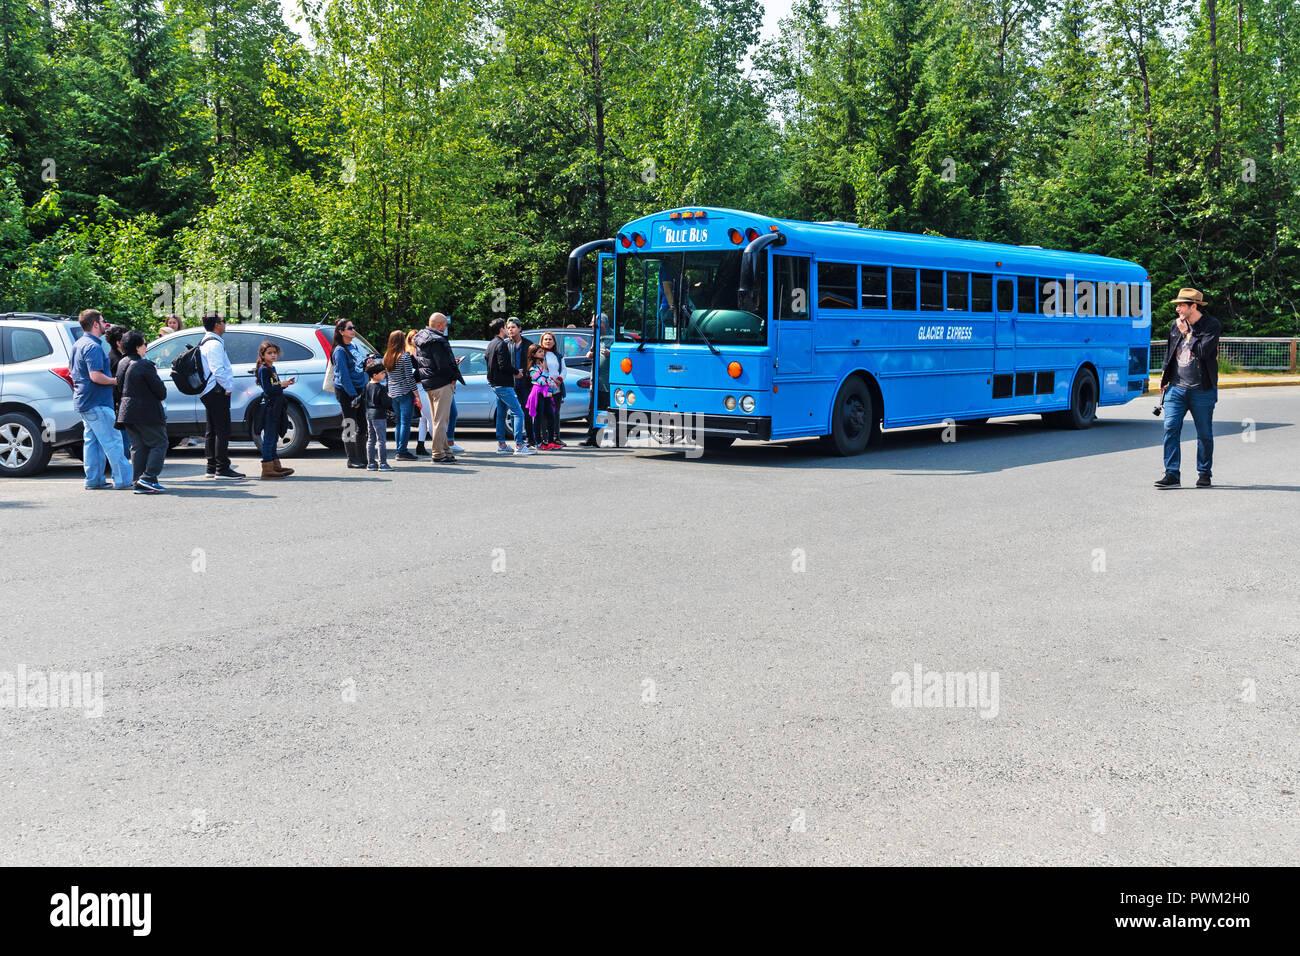 Bus stop, Mendenhall Glacier , Mendenhall Valley, Alaska, USA - Stock Image